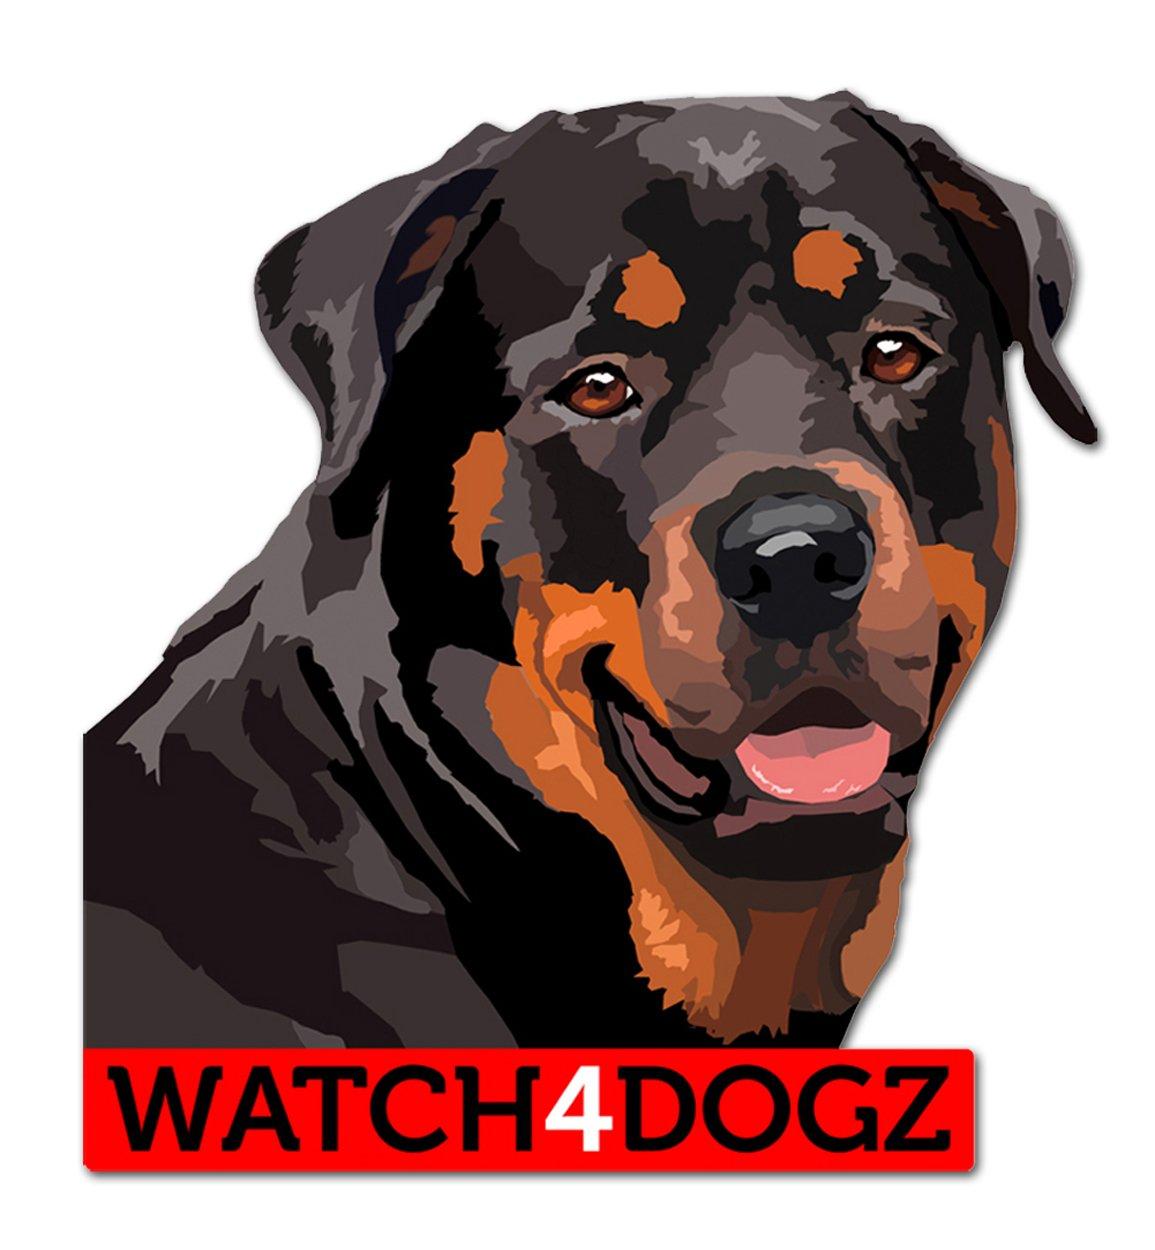 Rottweiler Decal Sticker 10x 11.5cm Pack of 2